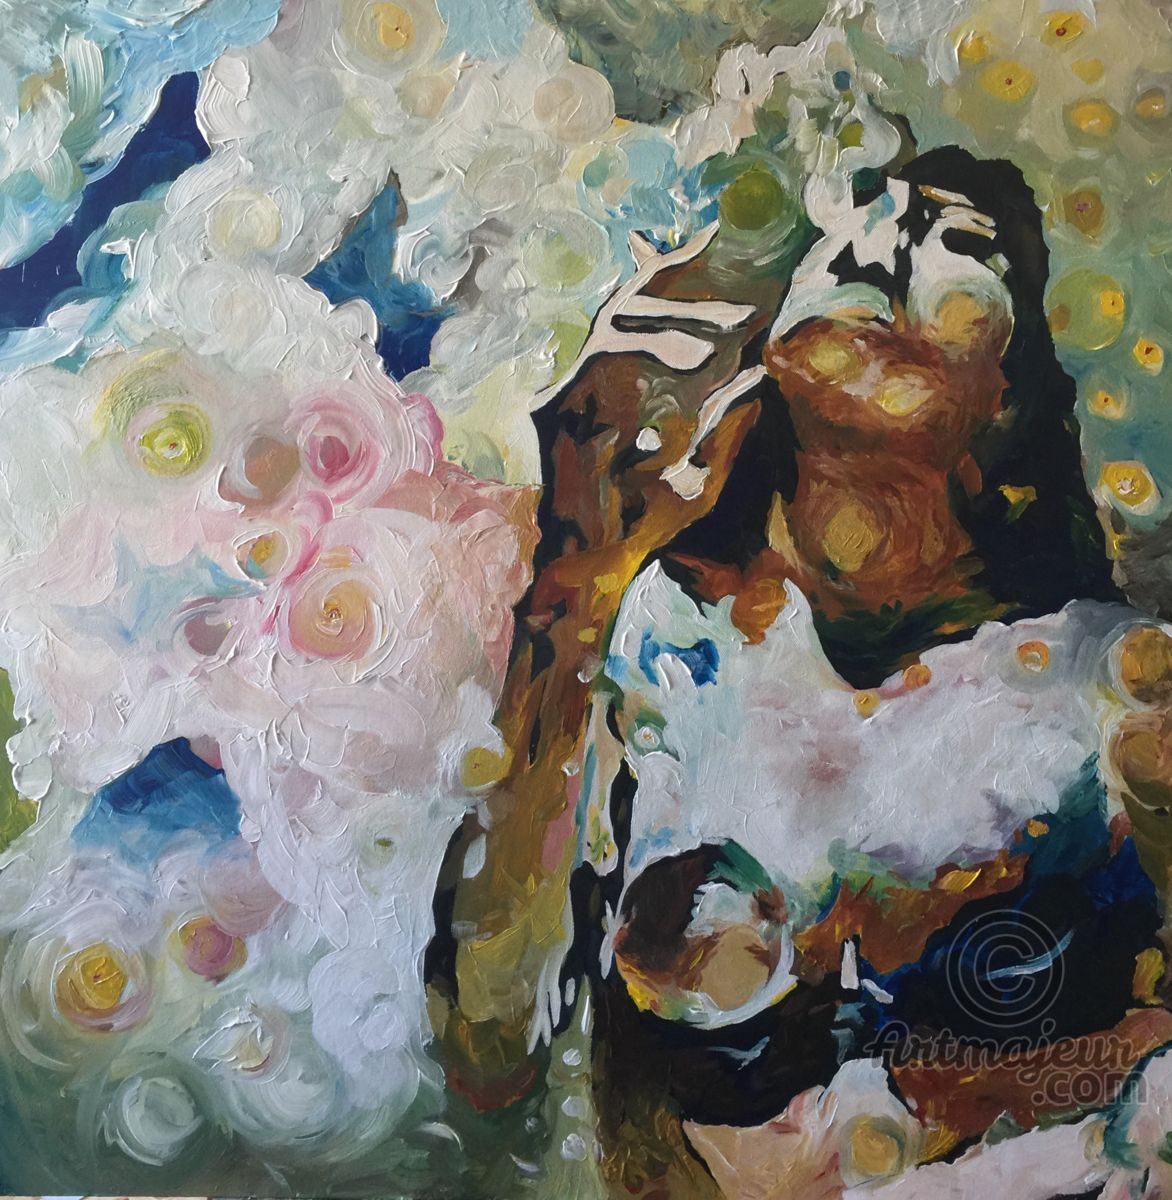 Vixen Painting by Lana | Artmajeur